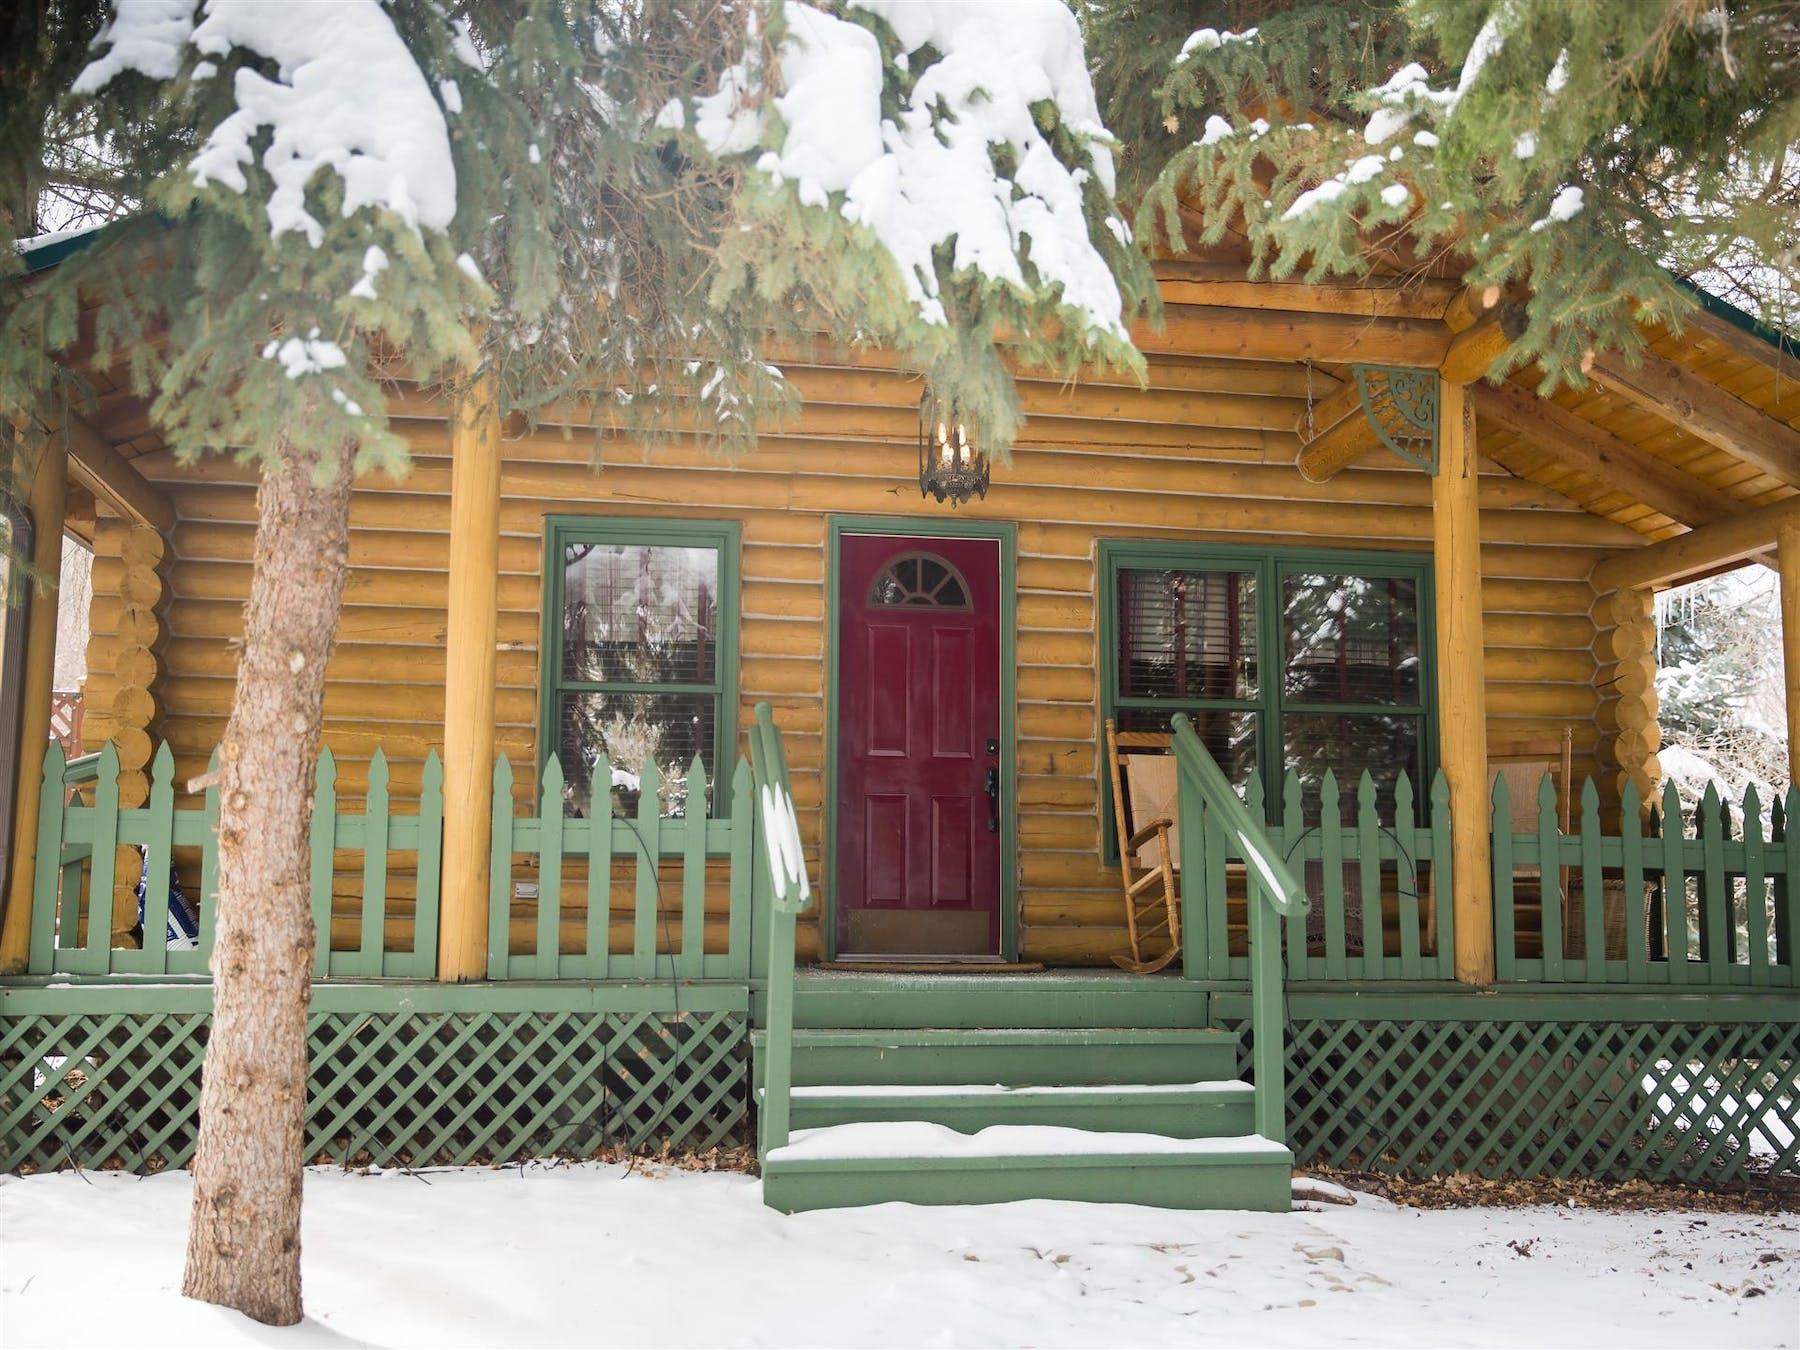 a snowy cabin entrance